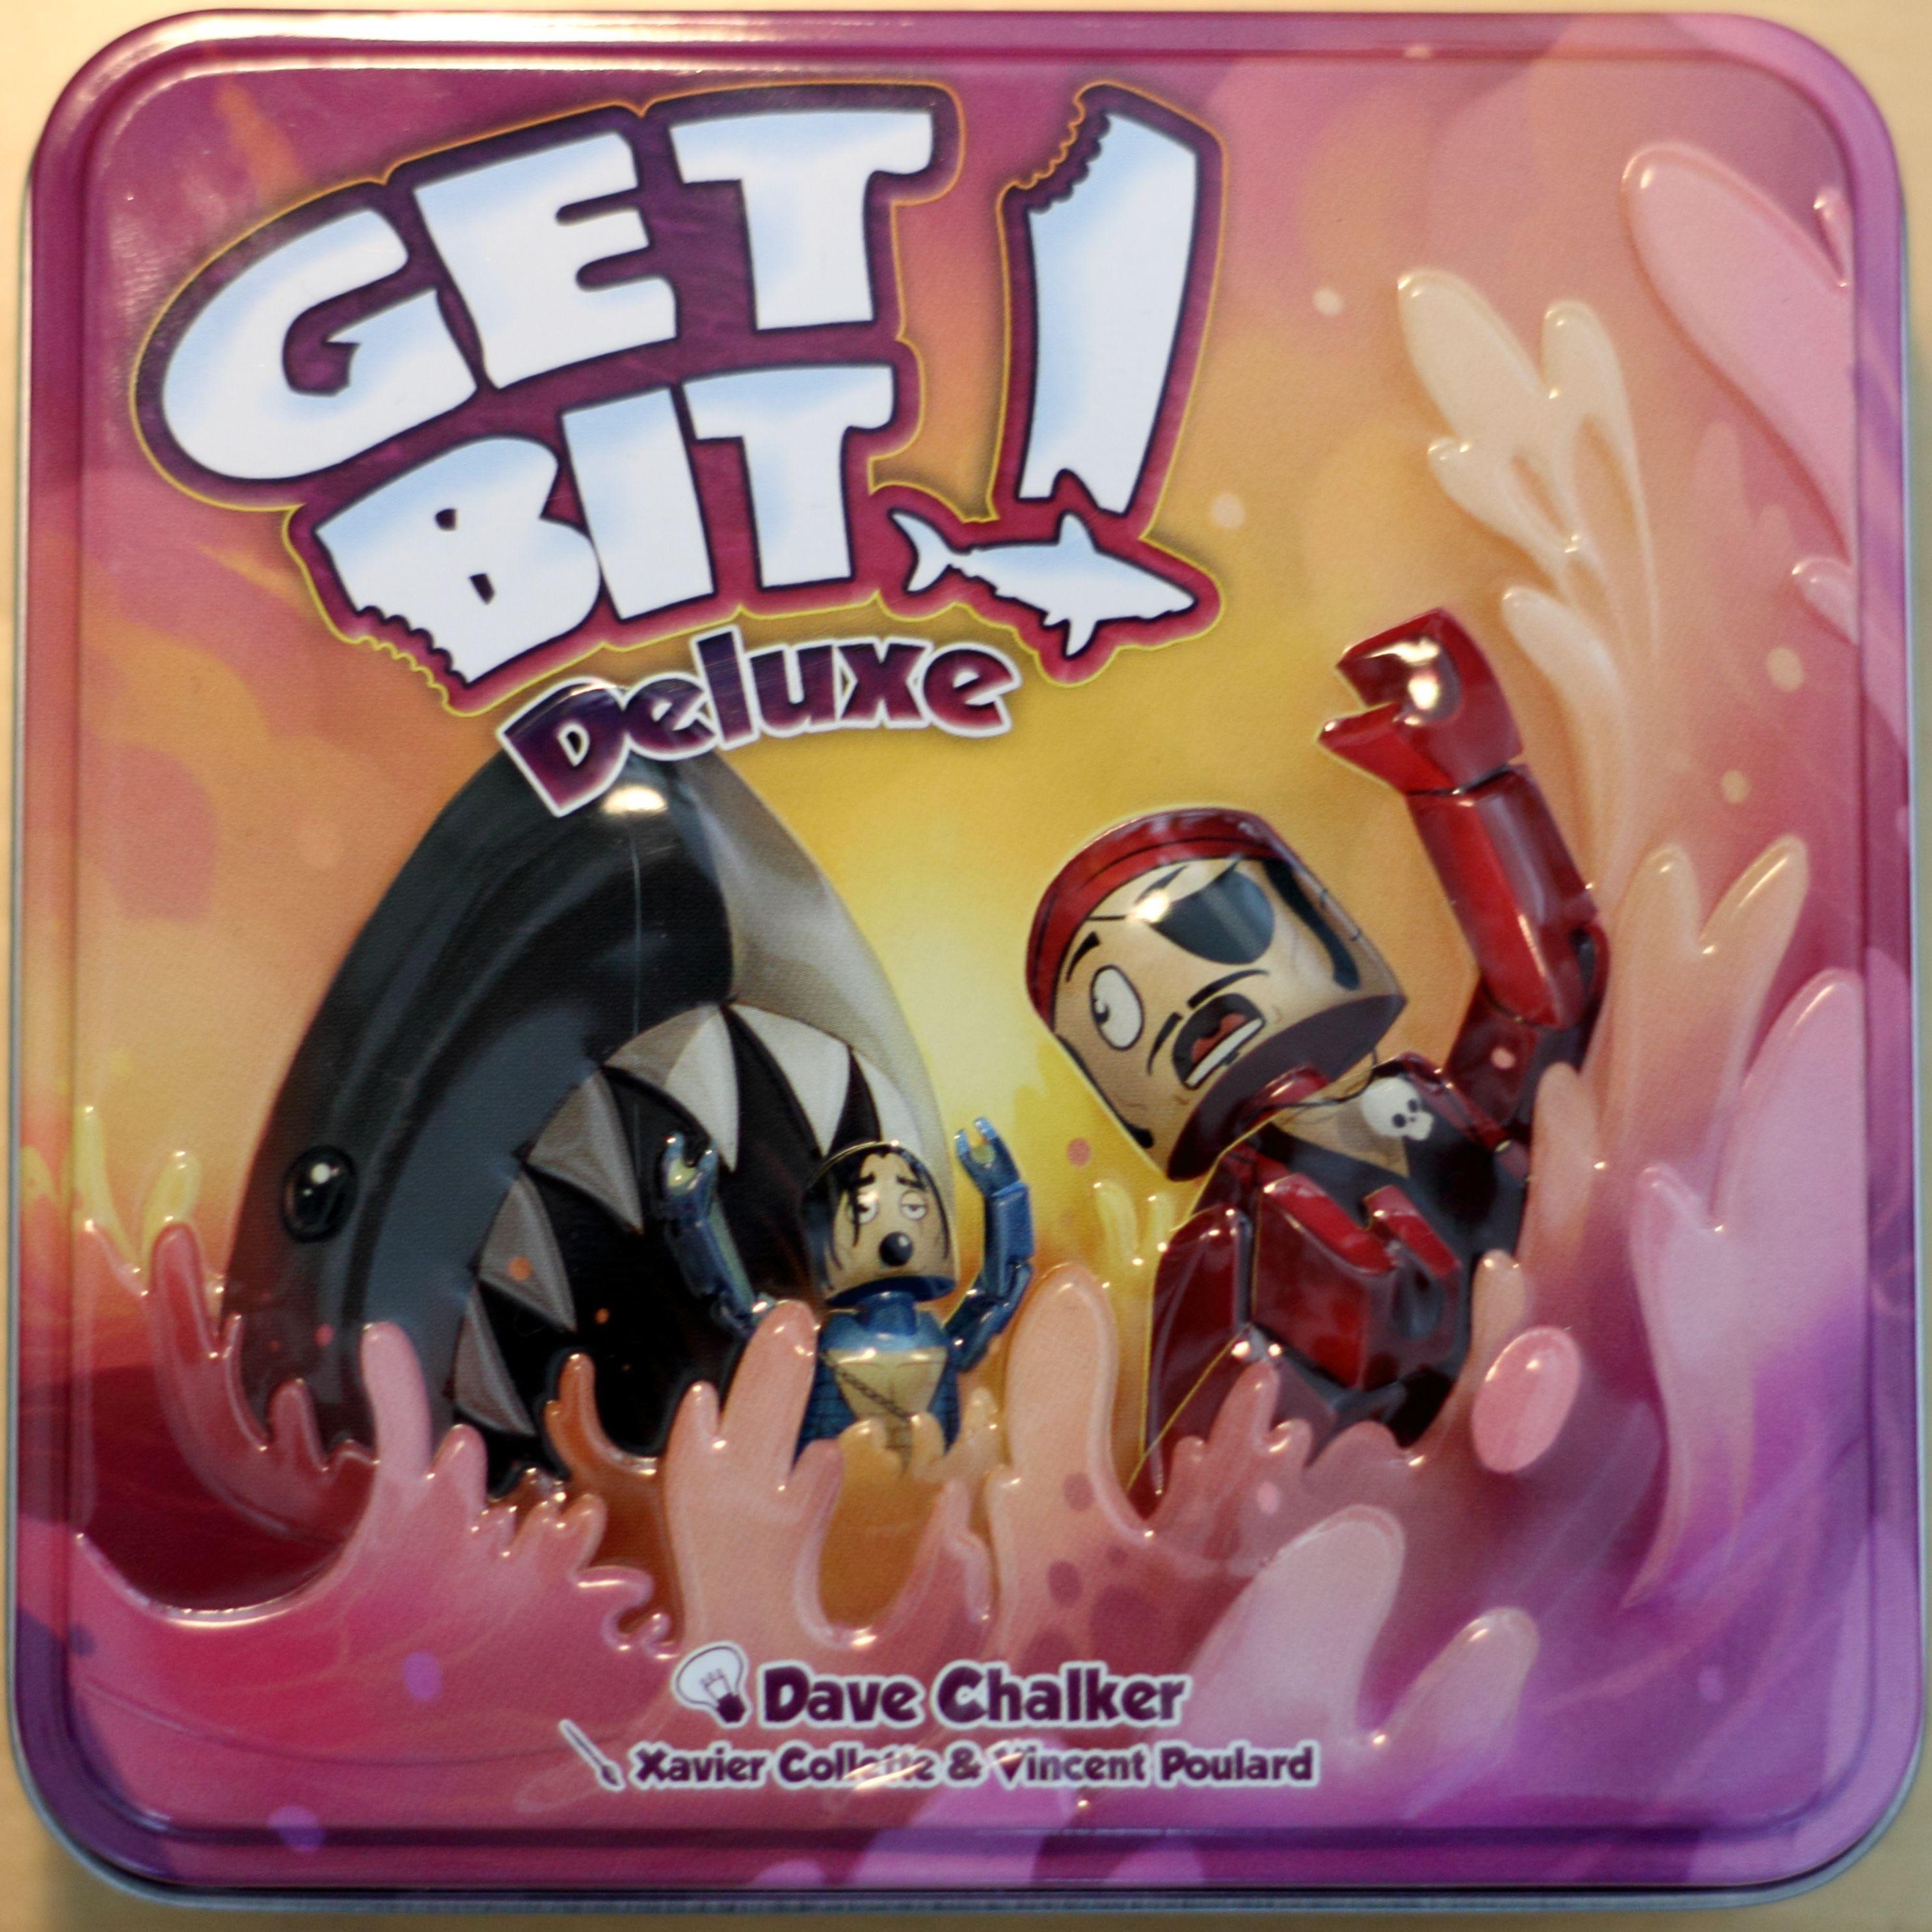 Get Bit!